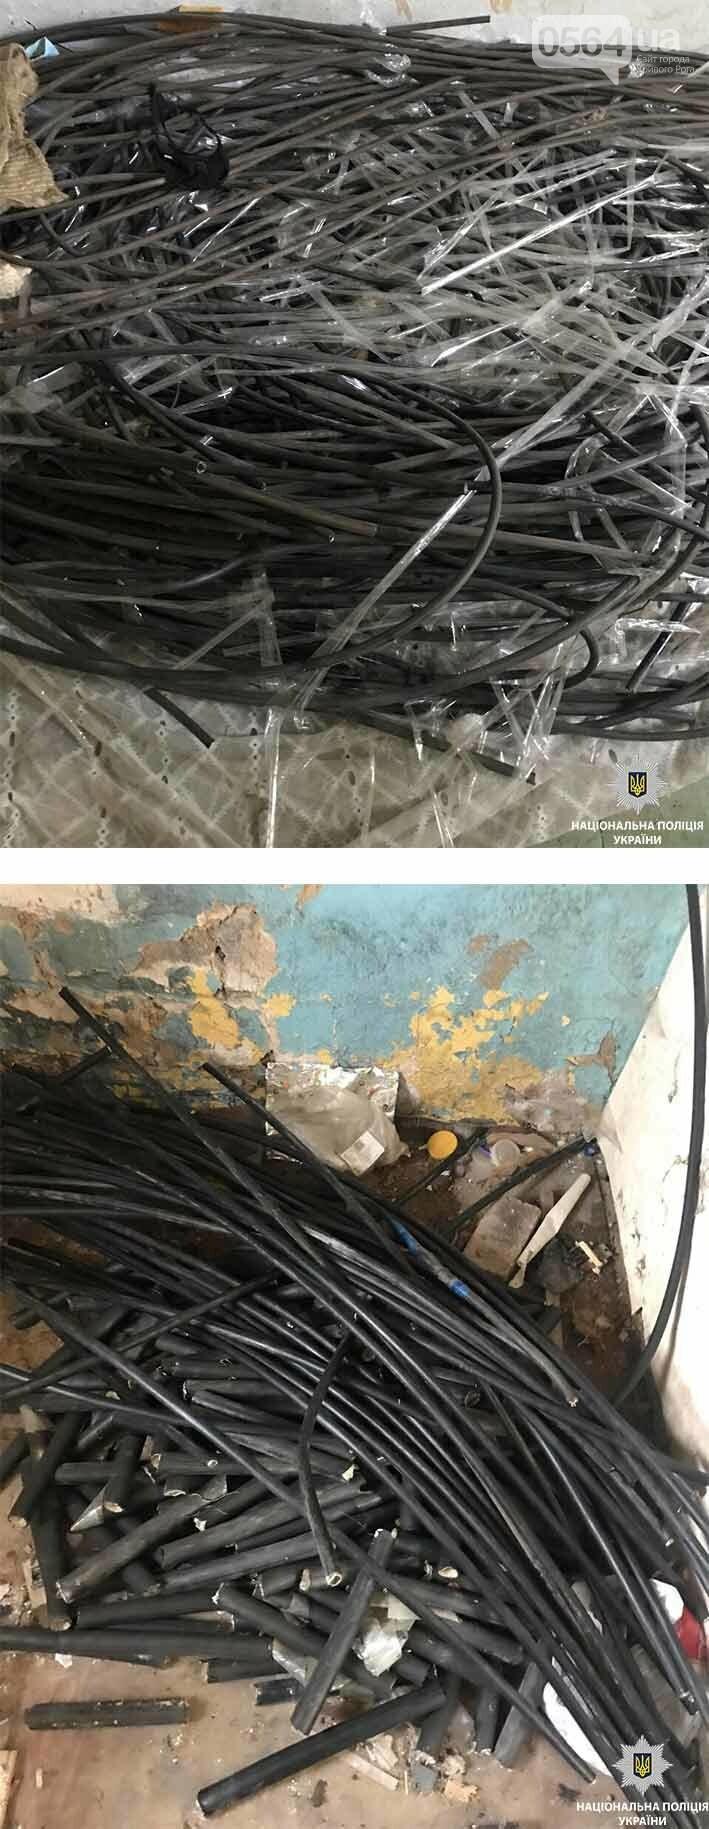 Криворожский рецидивист вырезал кабеля на несколько сотен тысяч гривен (ФОТО), фото-1